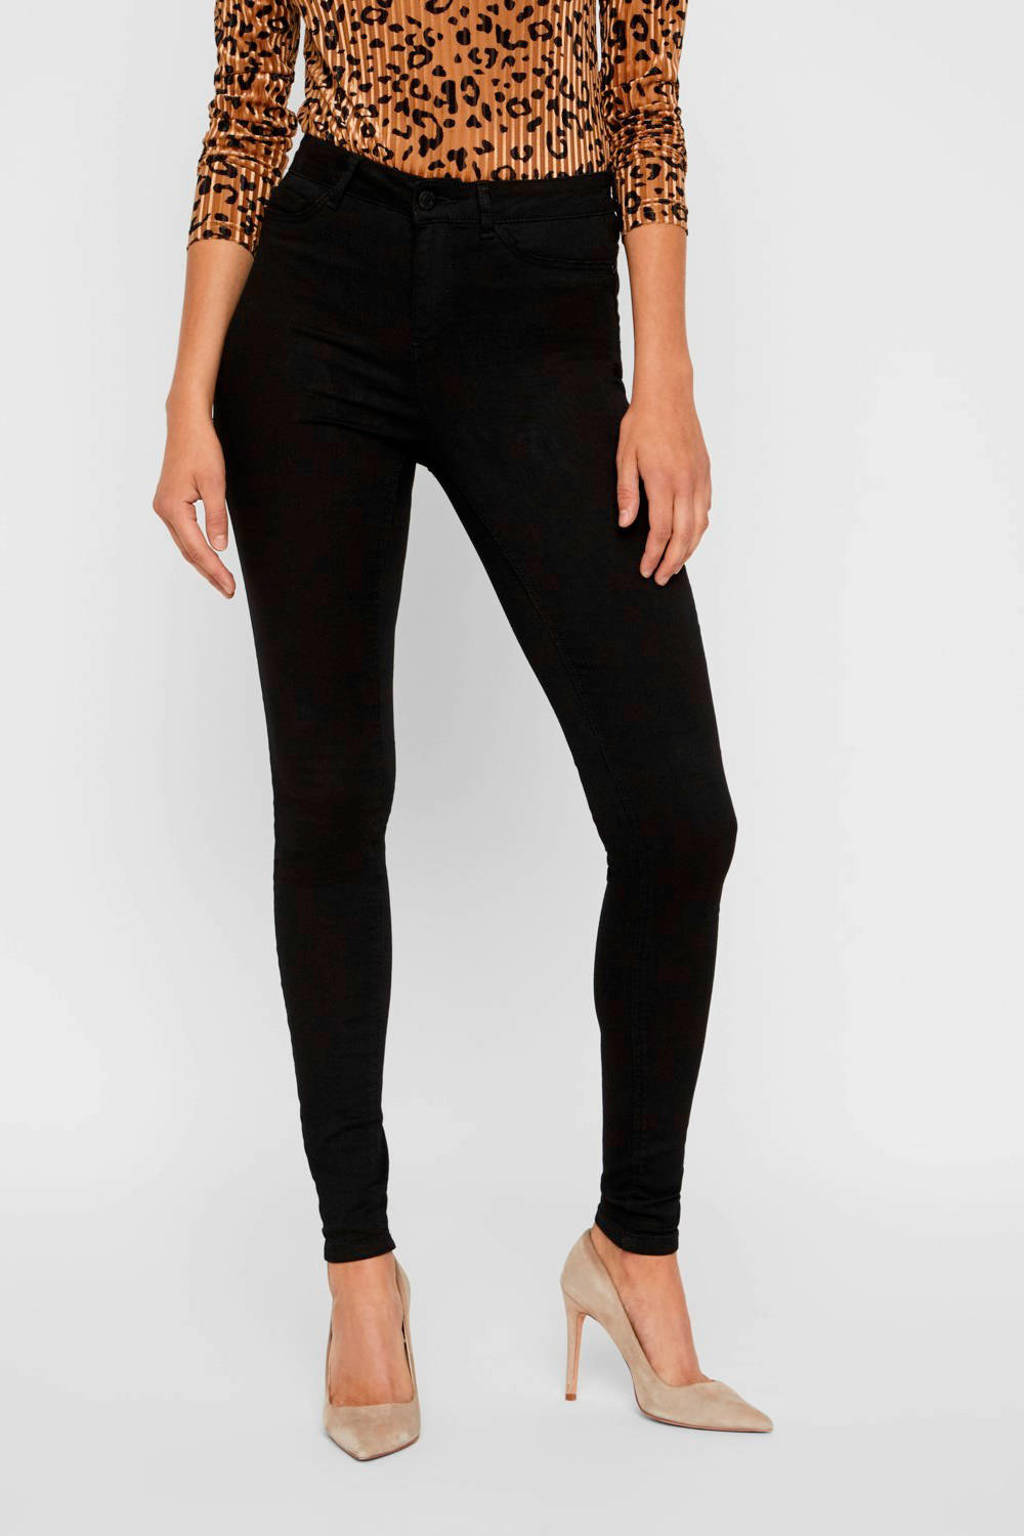 NOISY MAY high waist skinny jeans zwart, Zwart